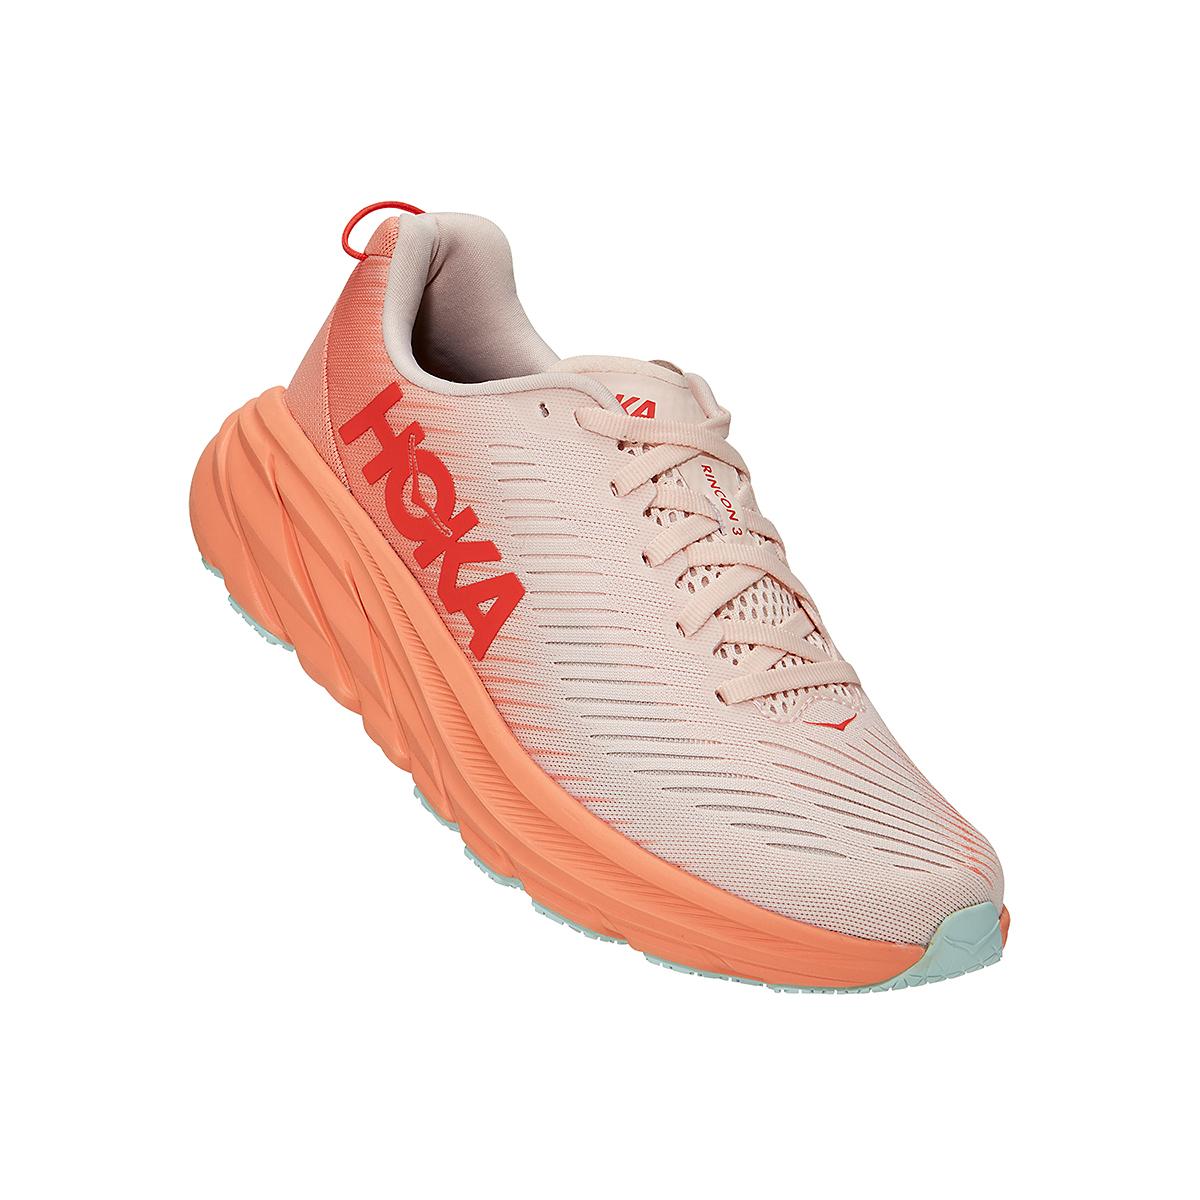 Women's Hoka One One Rincon 3 Running Shoe - Color: Silver Peony/Cantaloupe - Size: 5 - Width: Regular, Silver Peony/Cantaloupe, large, image 2